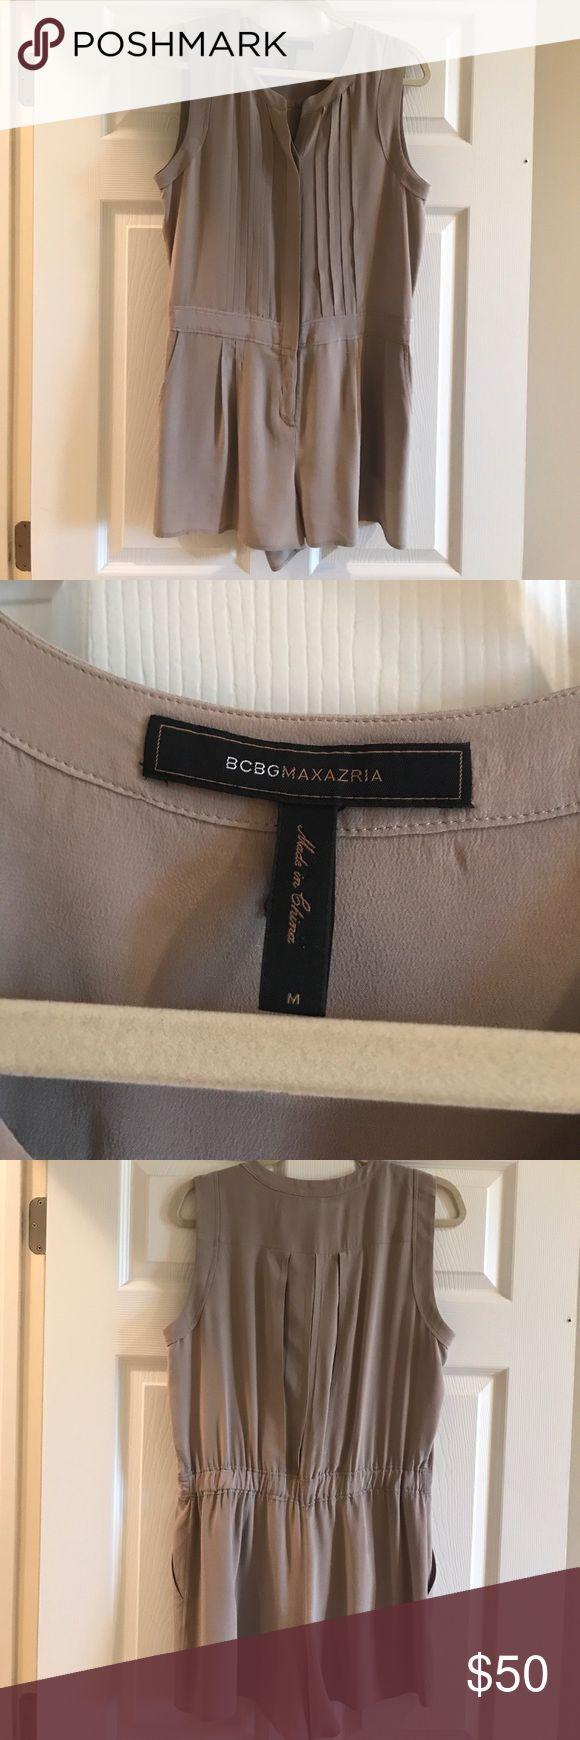 Selling this BCBG romper on Poshmark! My username is: shannski. #shopmycloset #poshmark #fashion #shopping #style #forsale #BCBG #Pants